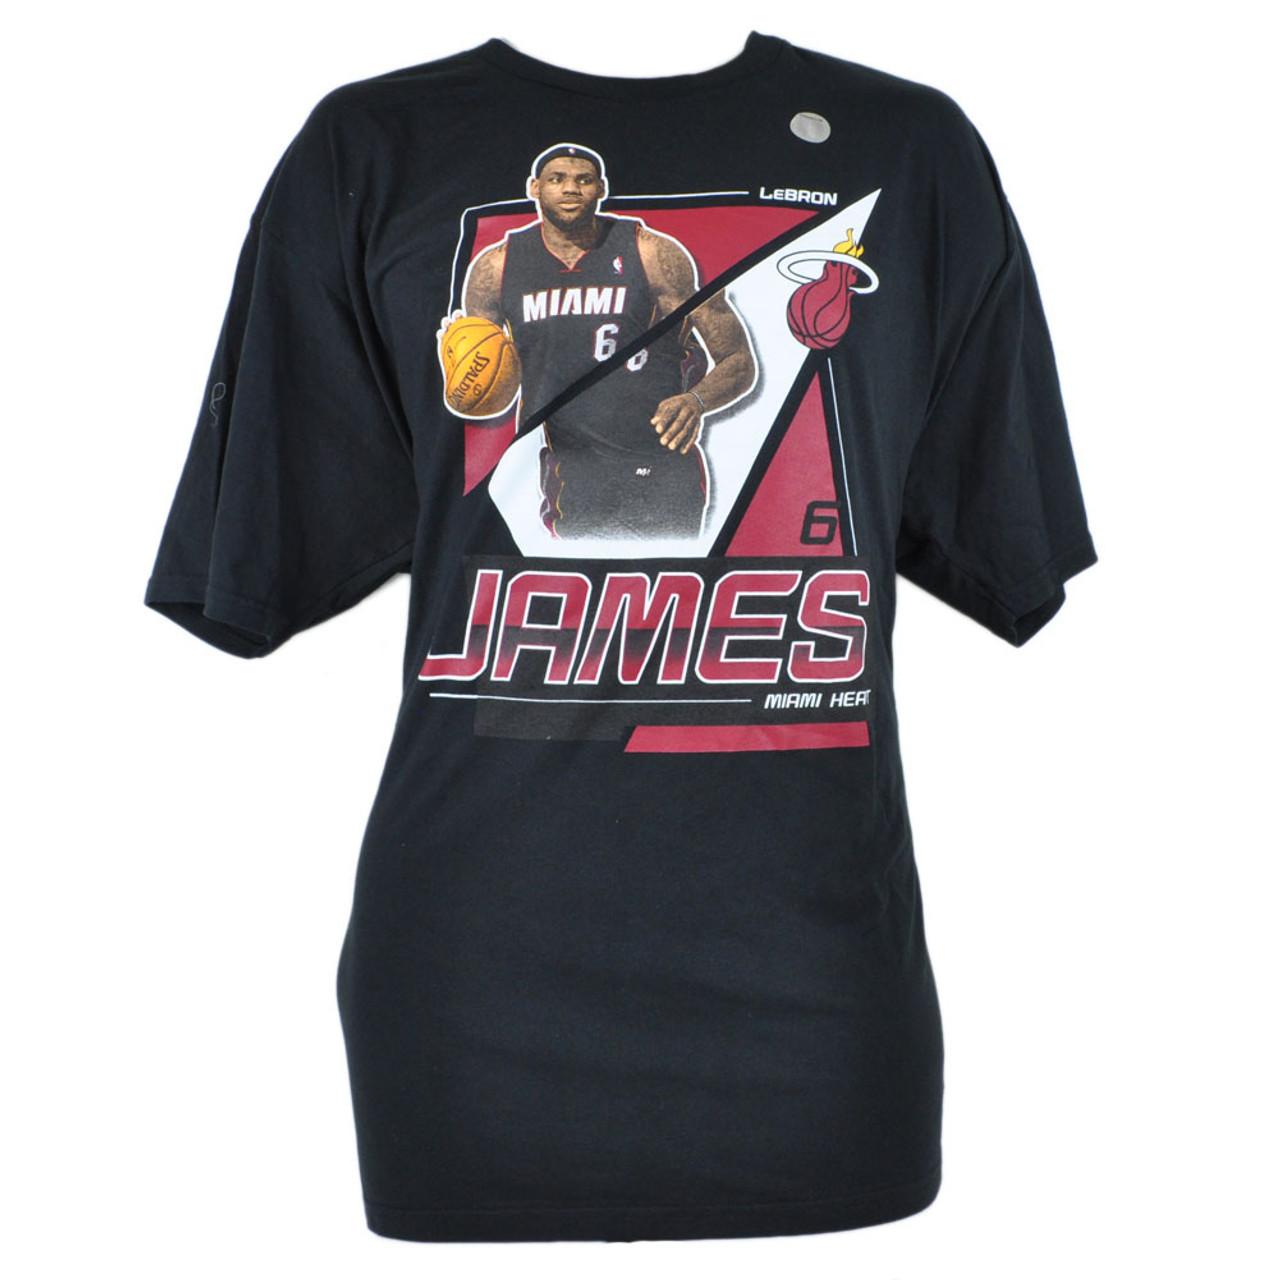 purchase cheap 5a10b ef400 NBA Adidas Miami Heat Lebron James 6 XXLarge 2XL Tshirt Tee Basketball Black